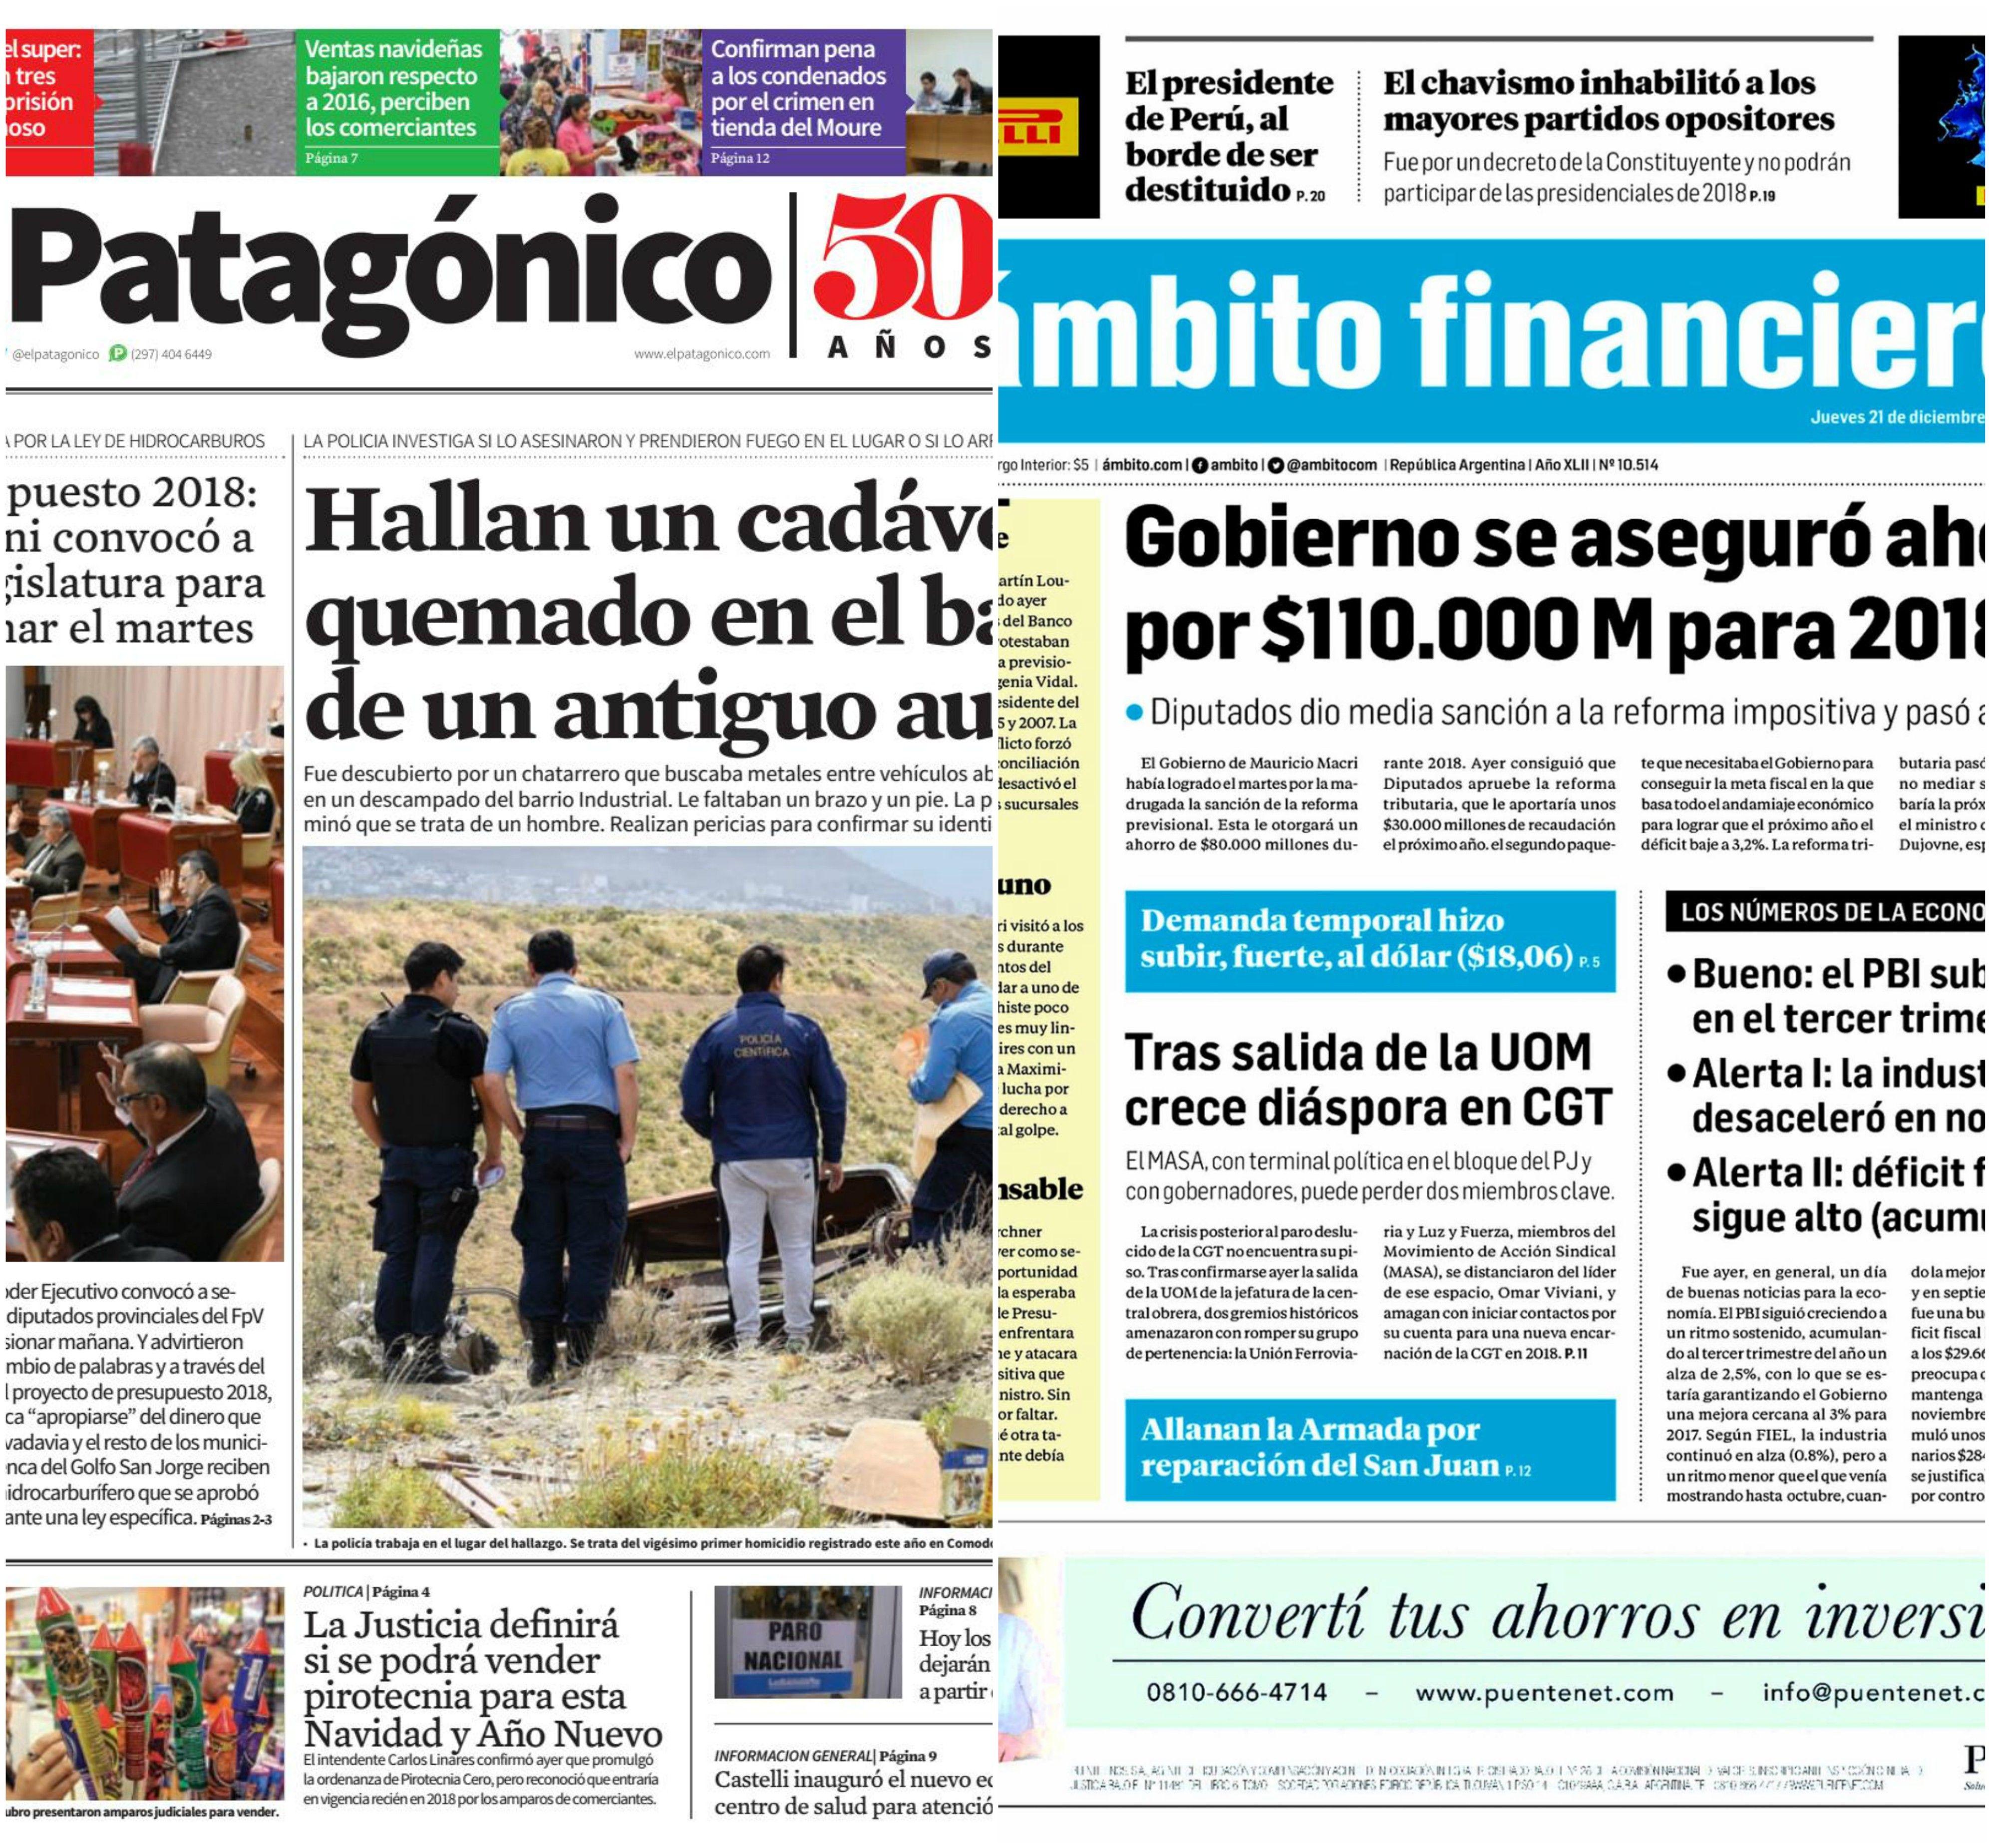 Tapas de diarios del jueves 21 de diciembre de 2017